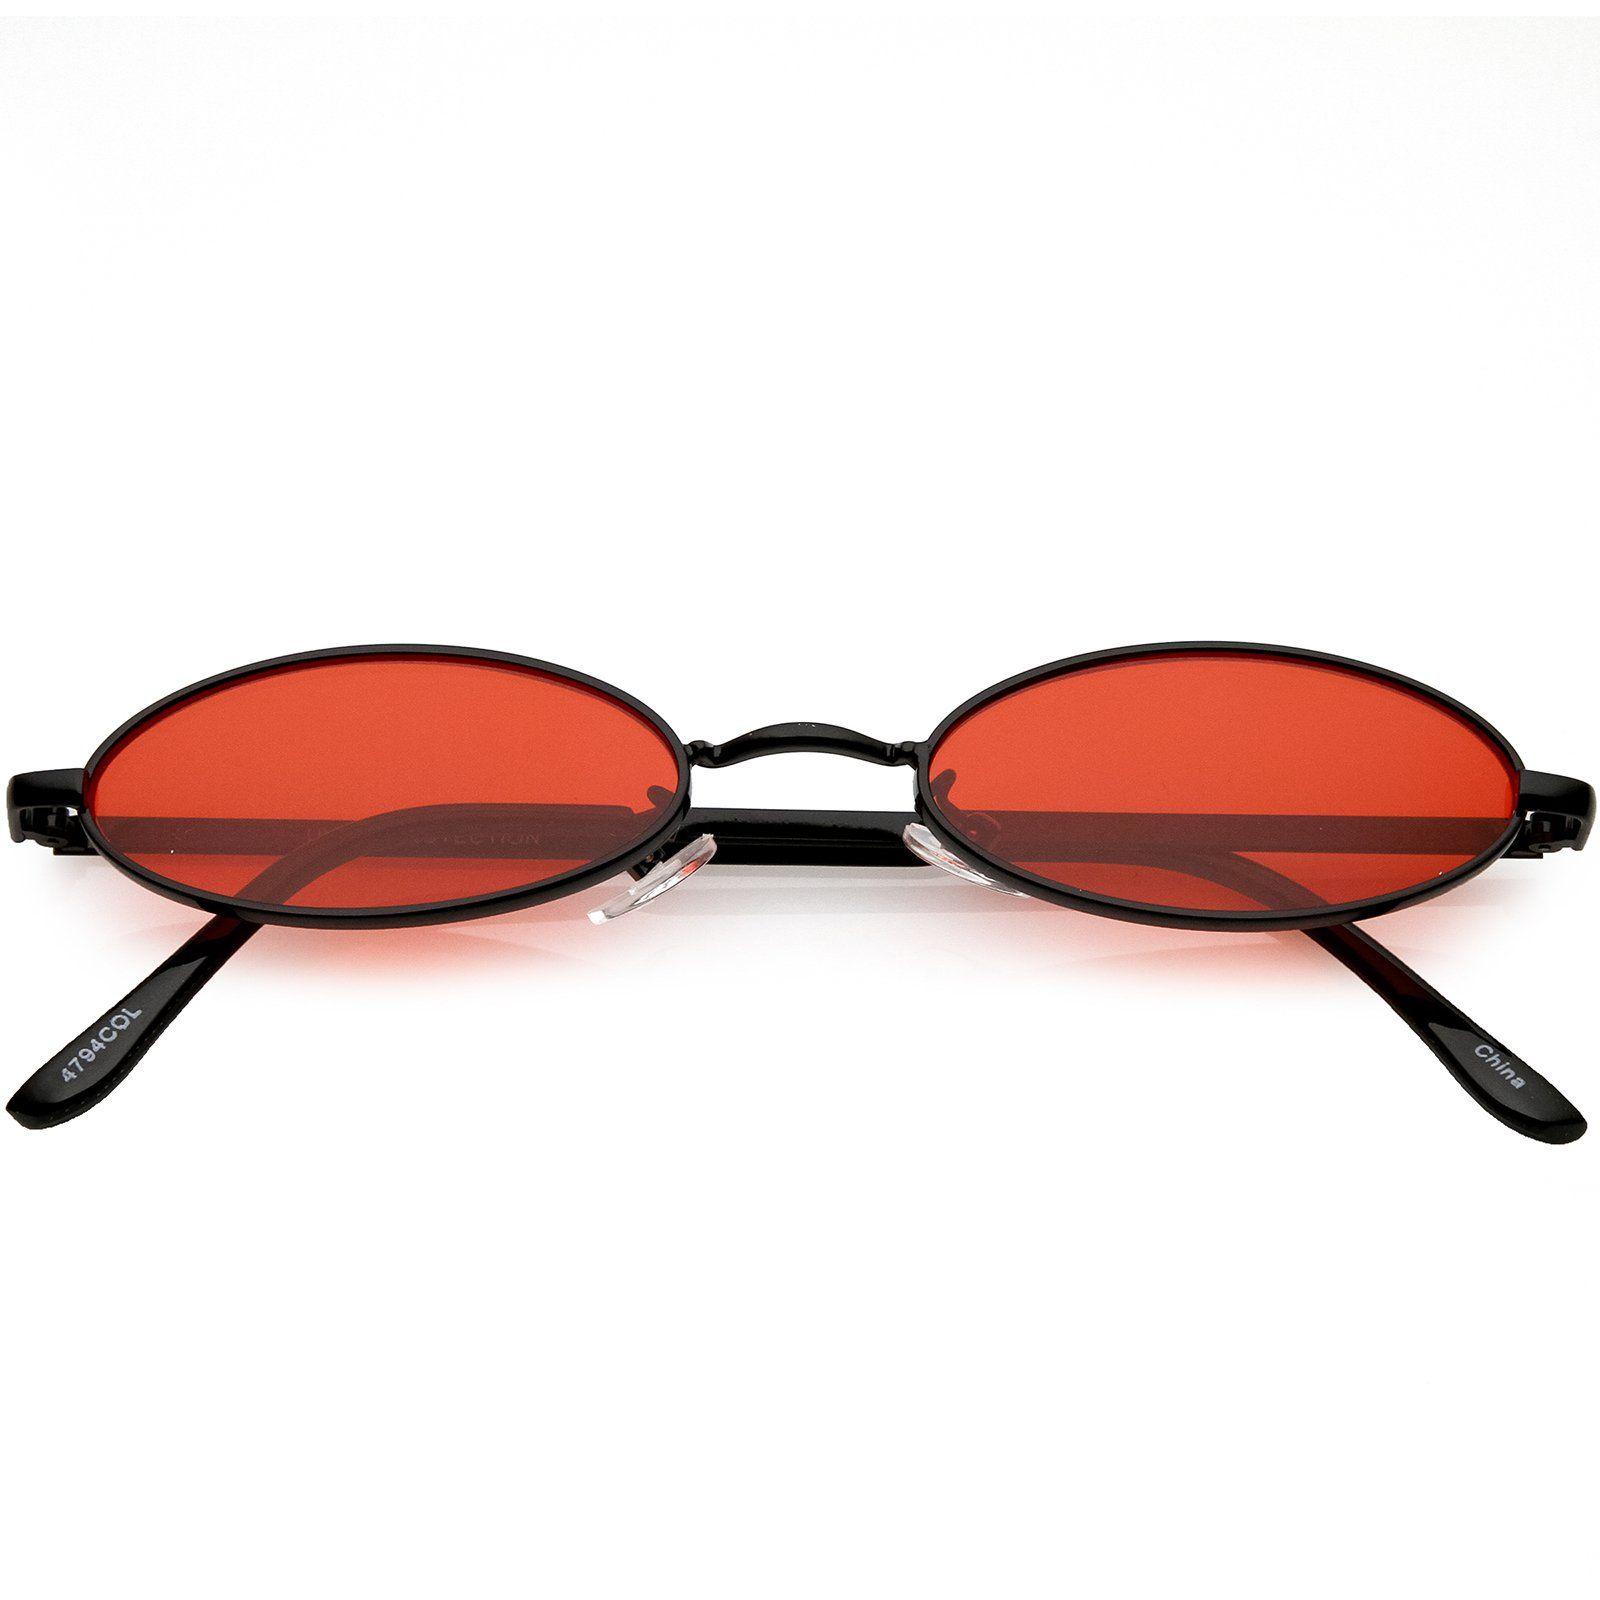 3c71c72323 Extreme Small Oval Sunglasses Color Tinted Flat Lens 51mm  sunglass  frame   sunglasses  summer  cateye  purple  womens  oversized  mirrored  sunglassla